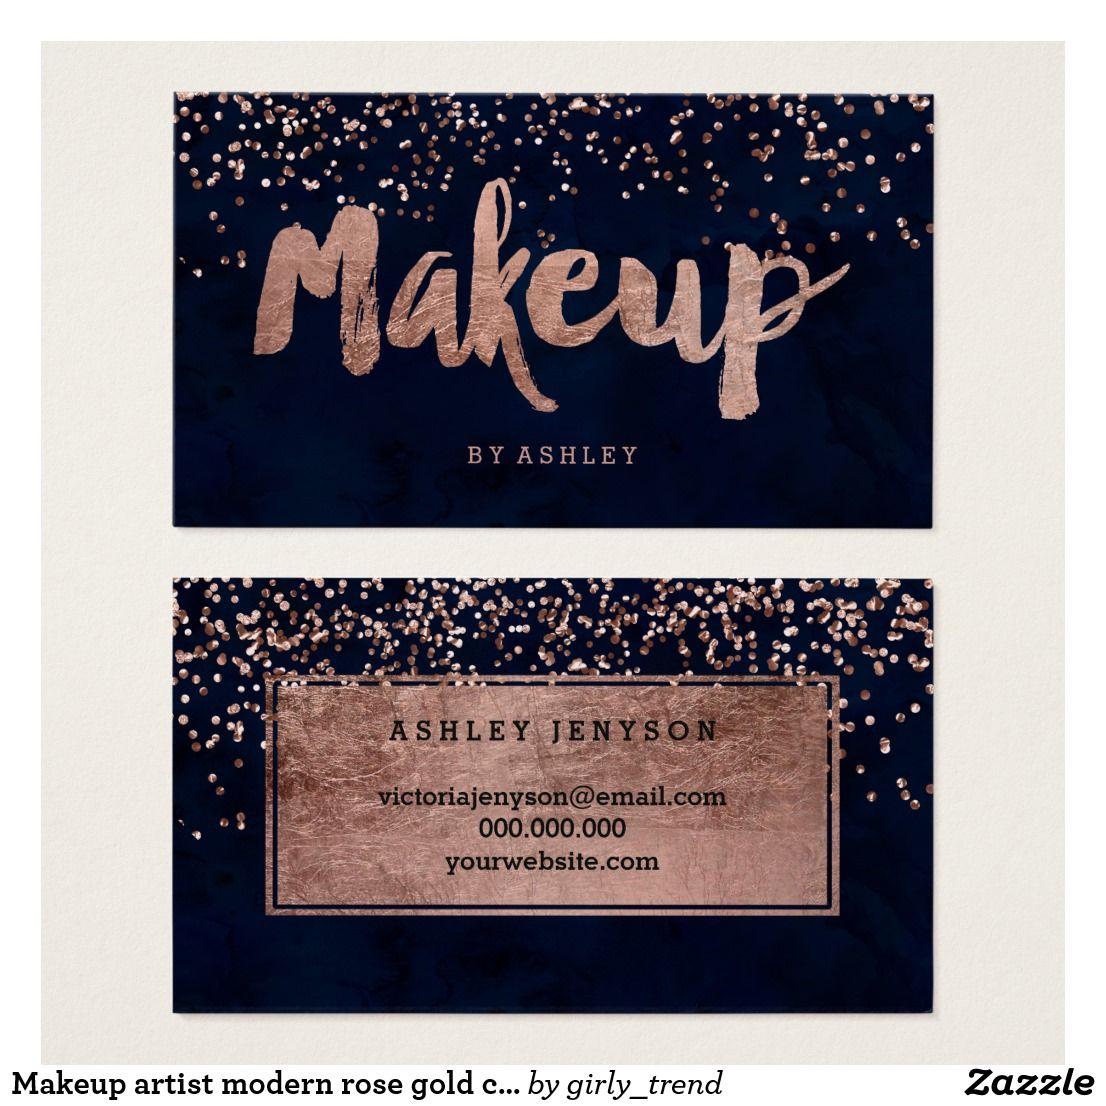 Artist modern rose gold confetti navy blue business card makeup artist modern rose gold confetti navy blue business card colourmoves Gallery